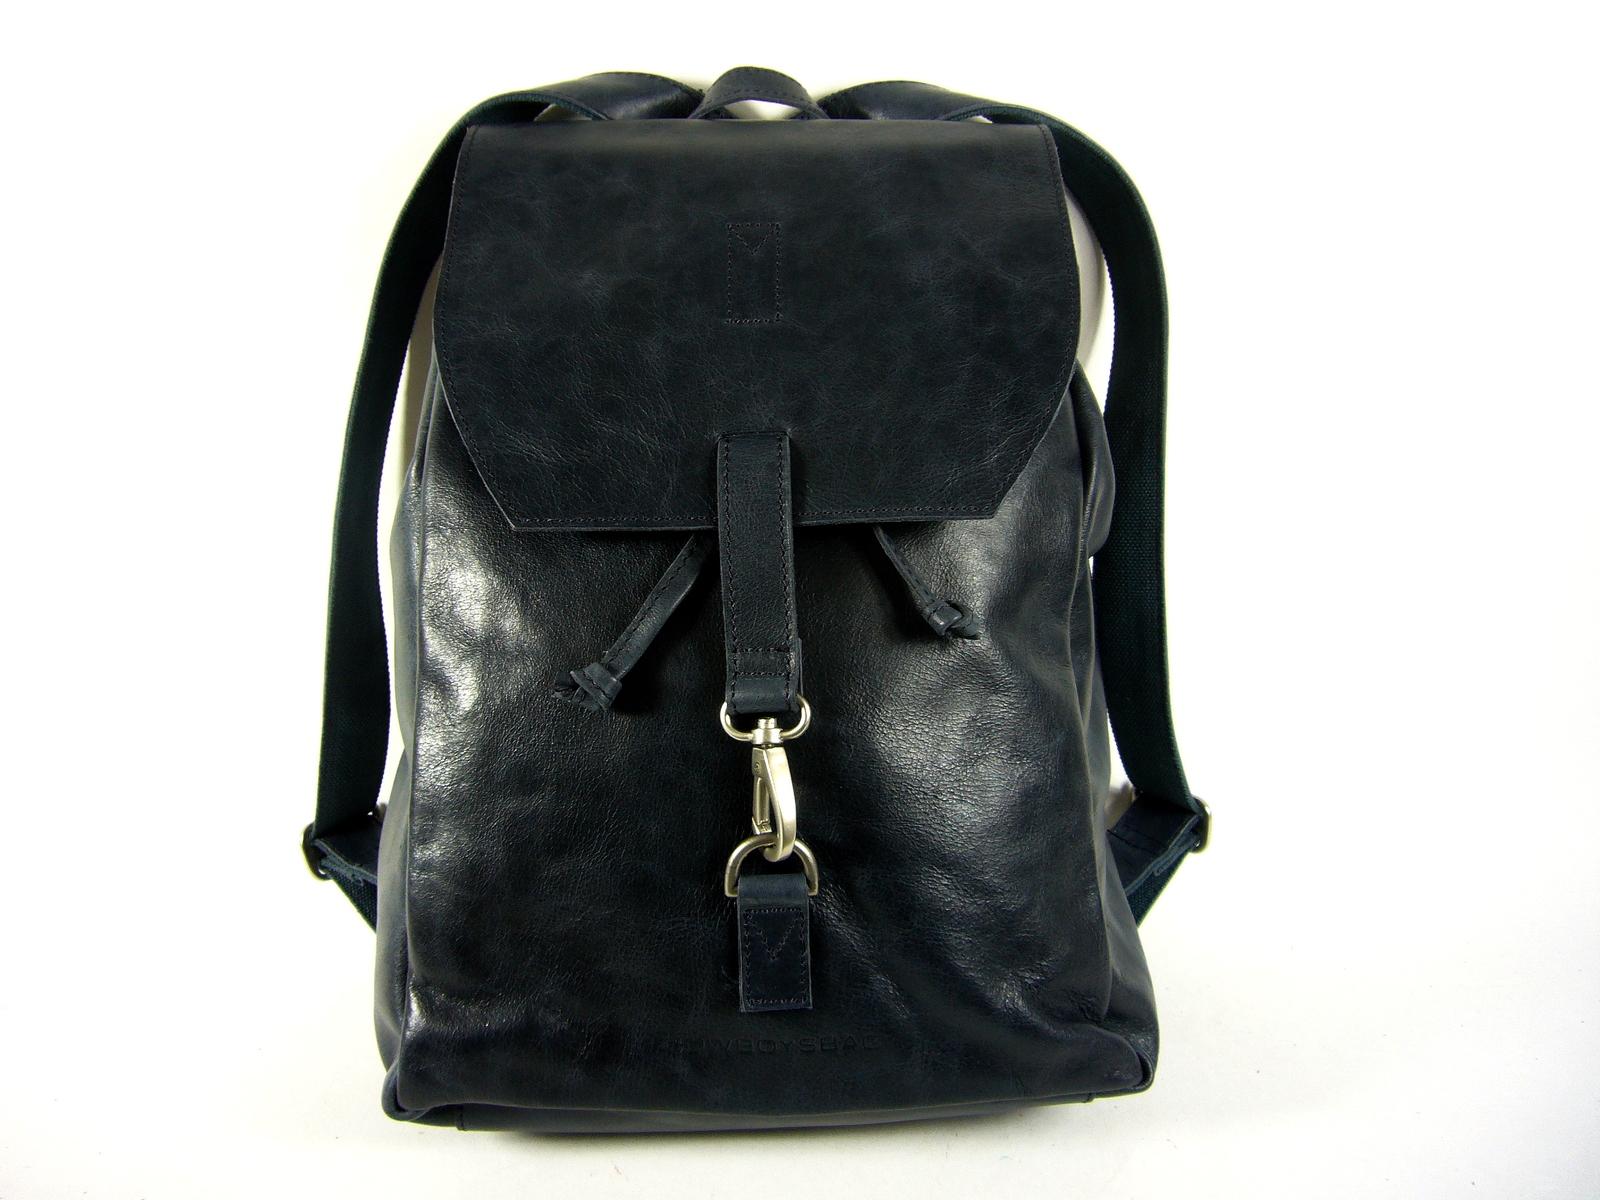 8b2f85ce0c Grand sac à dos homme cuir noir Tamarac/Cowboysbag - Espritcuir